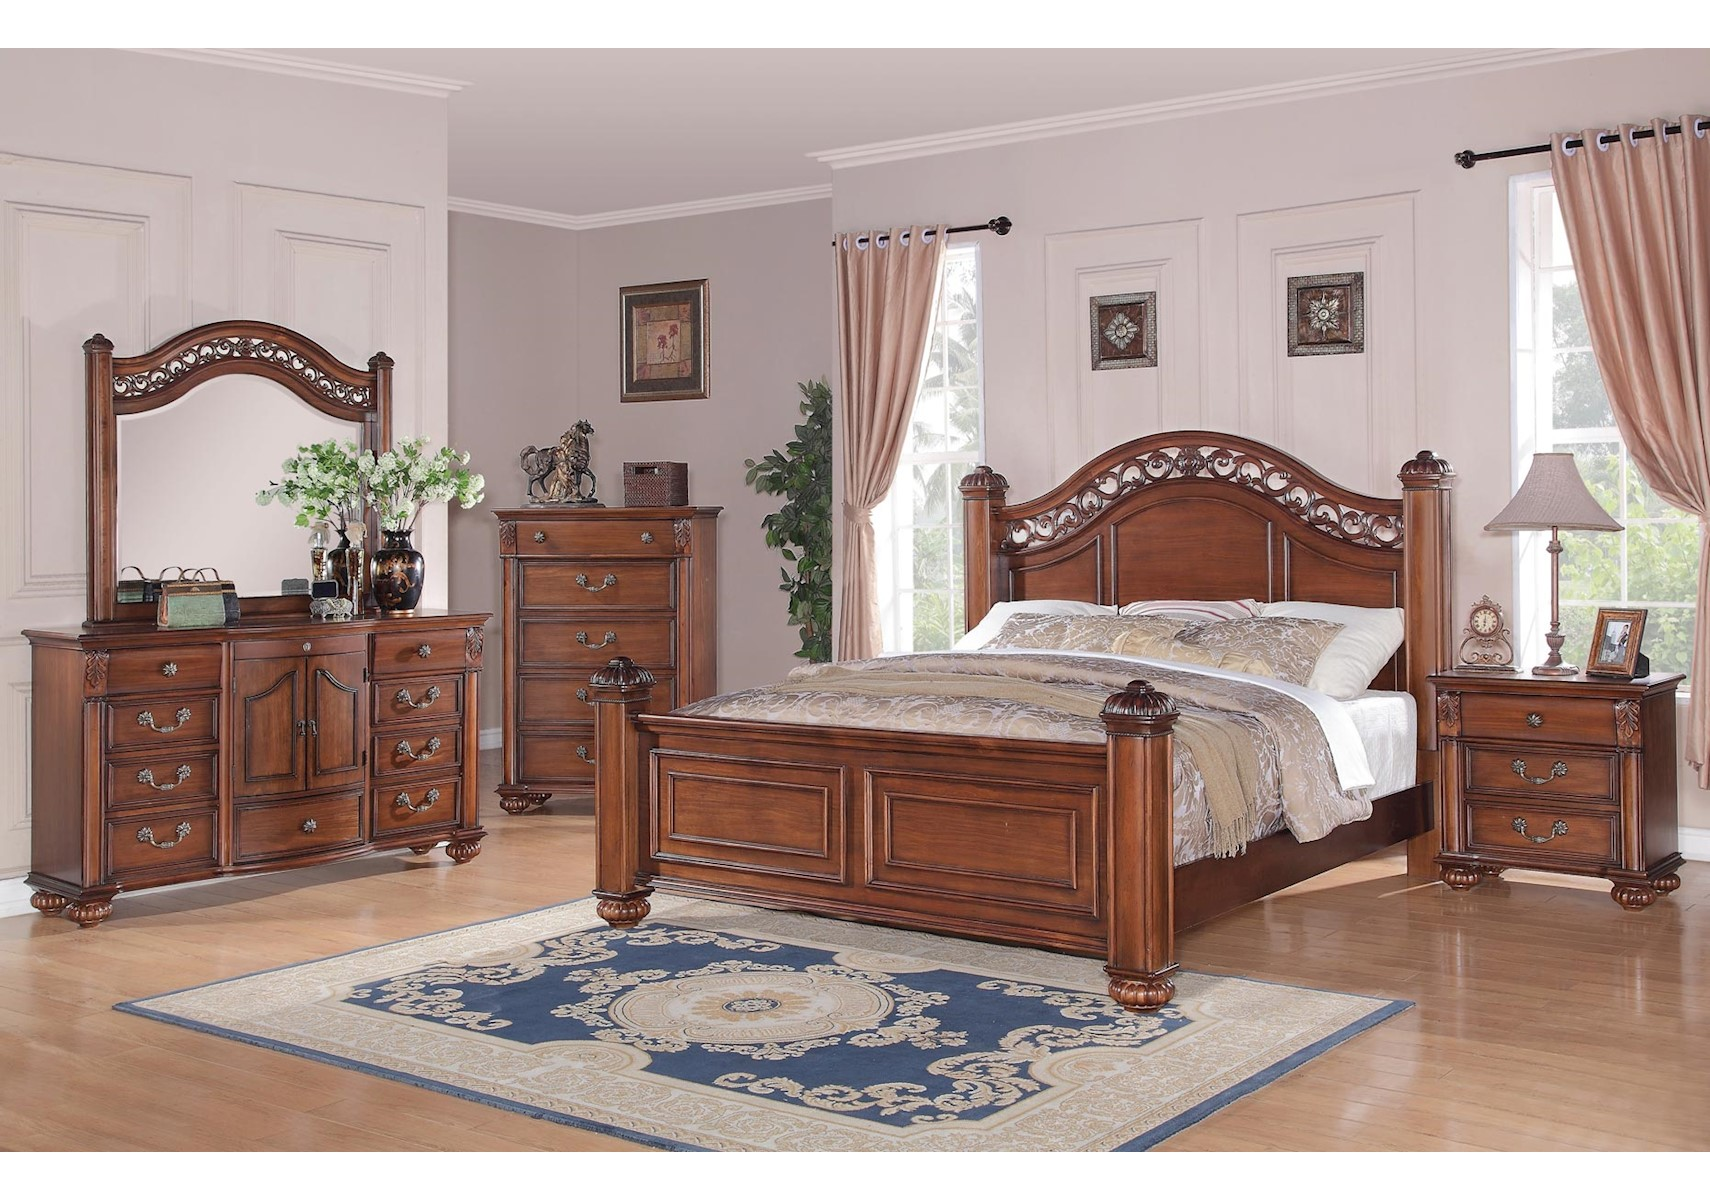 Lacks | Barkley Square 4-Pc Queen Bedroom Set